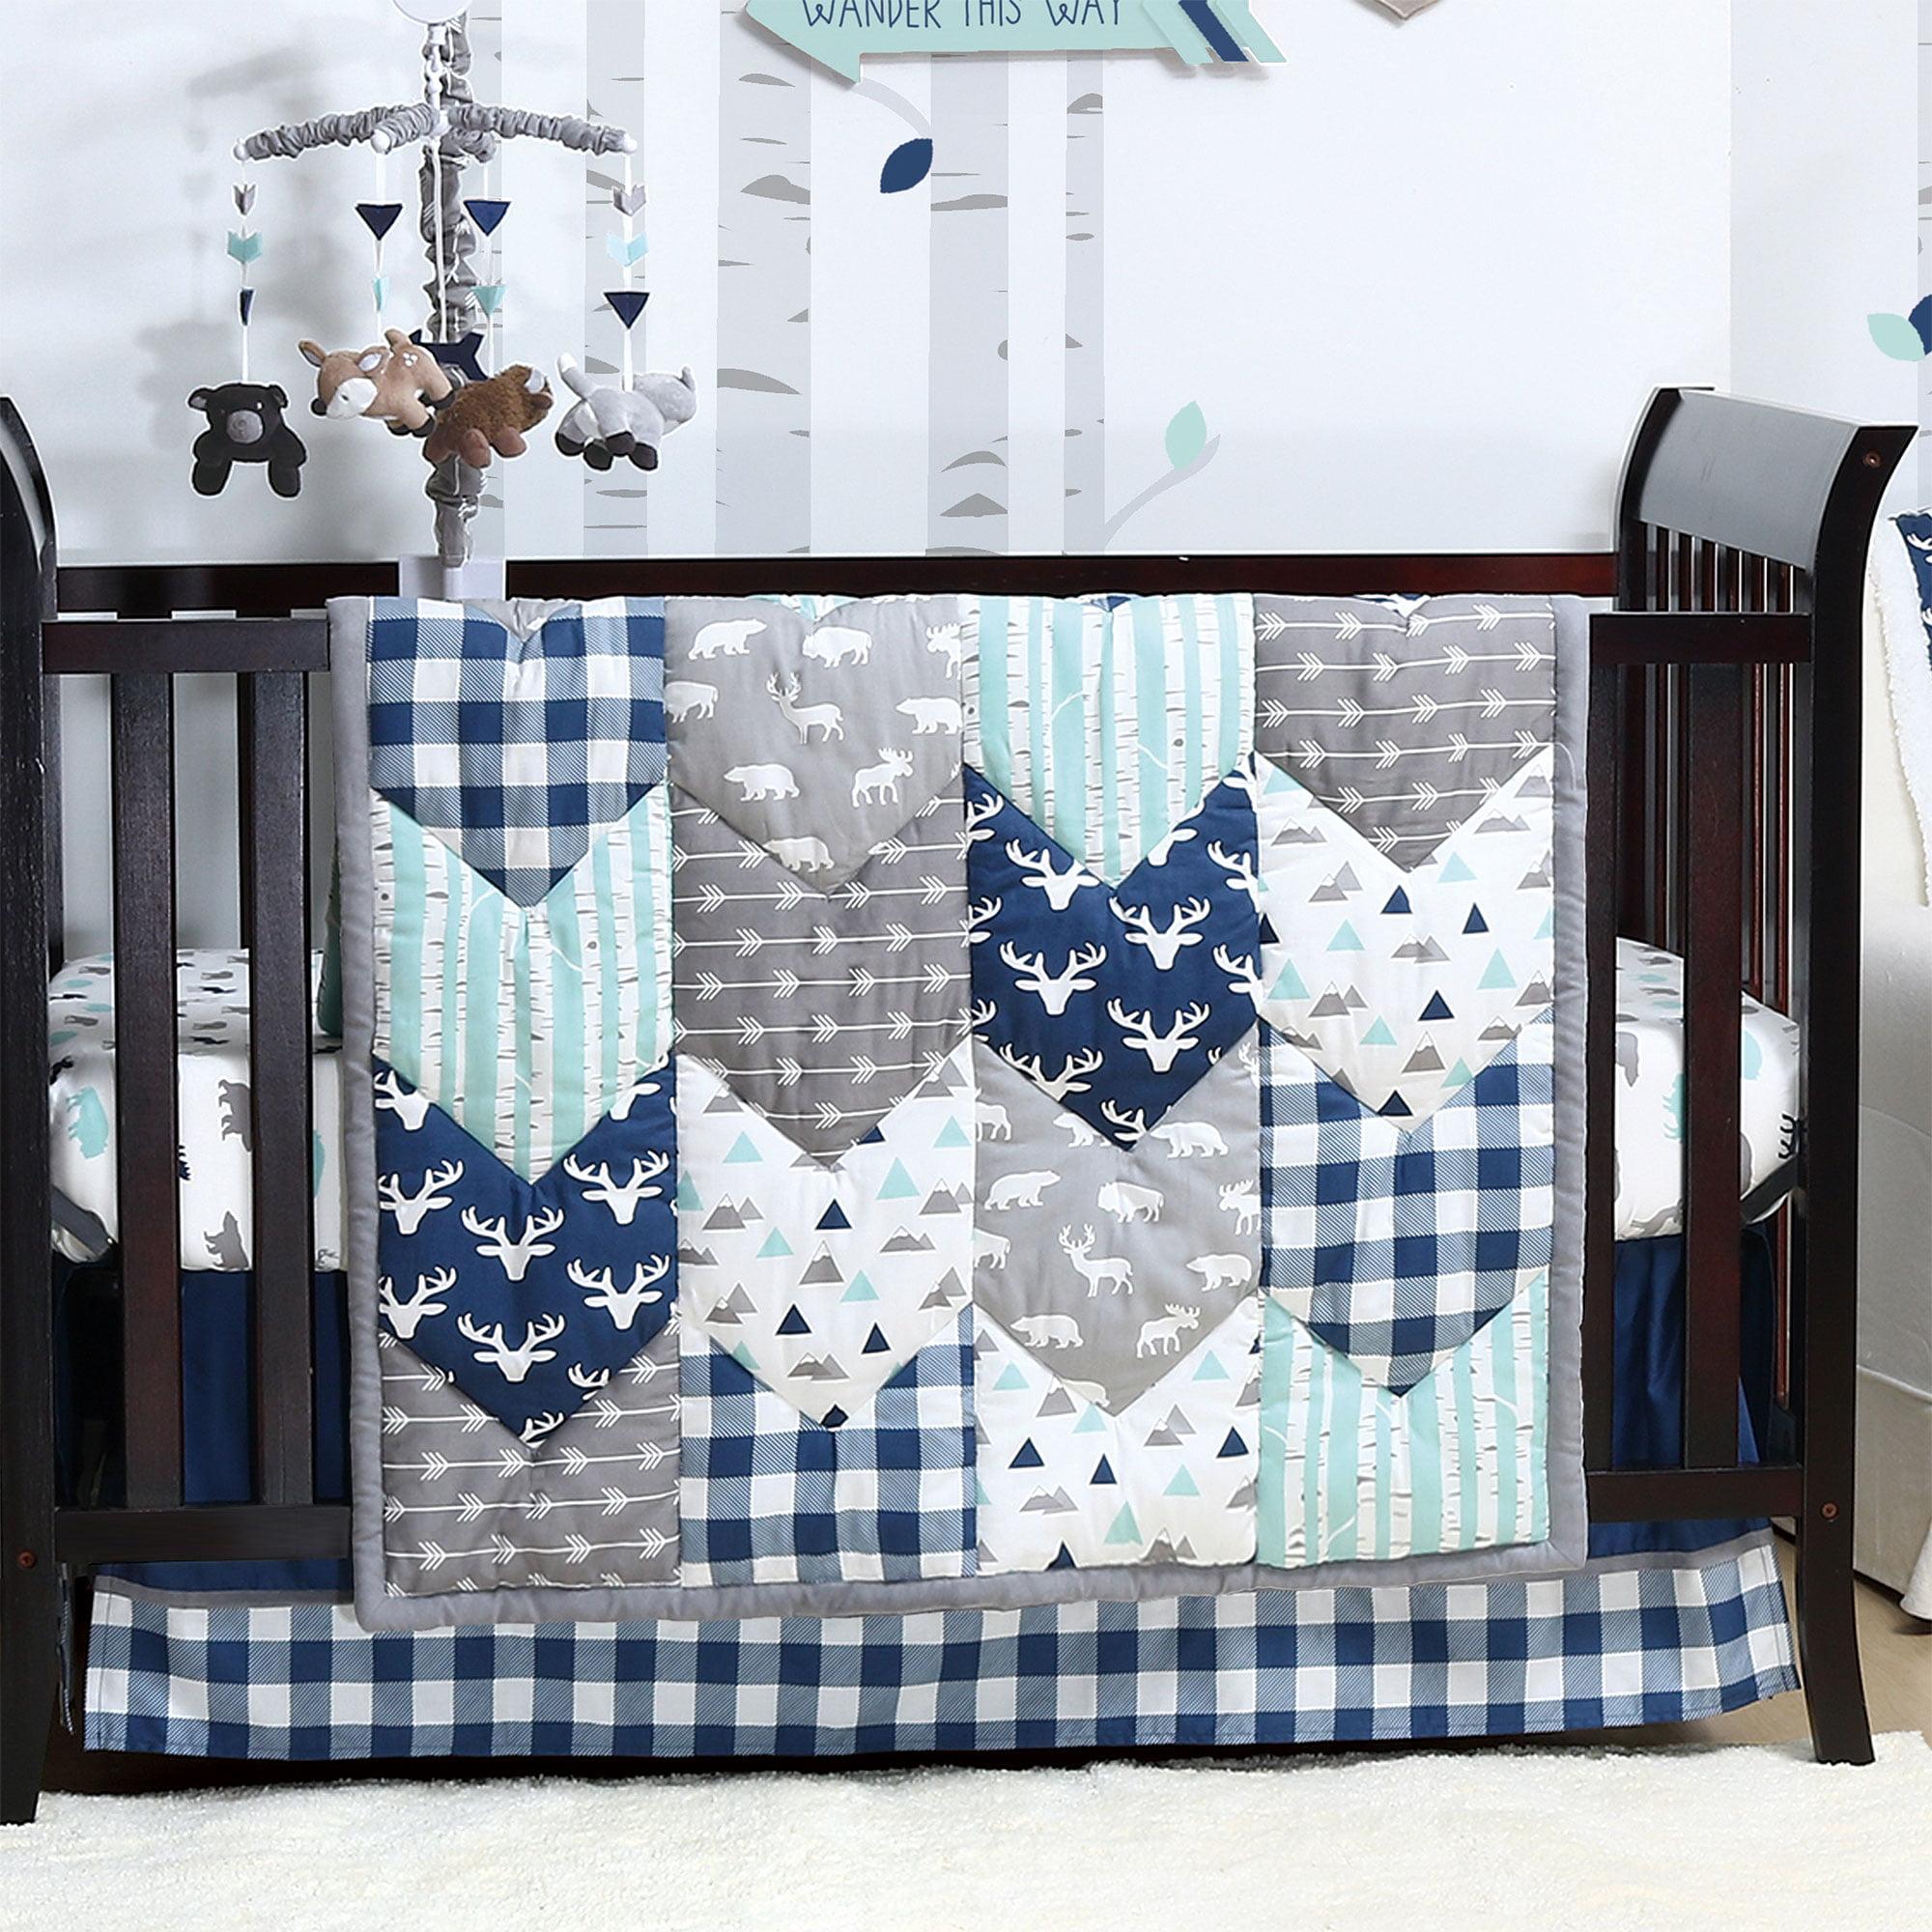 Woodland Trail 5 Piece Baby Boy Crib Bedding Set Forest Animal Theme by The Peanut Shell